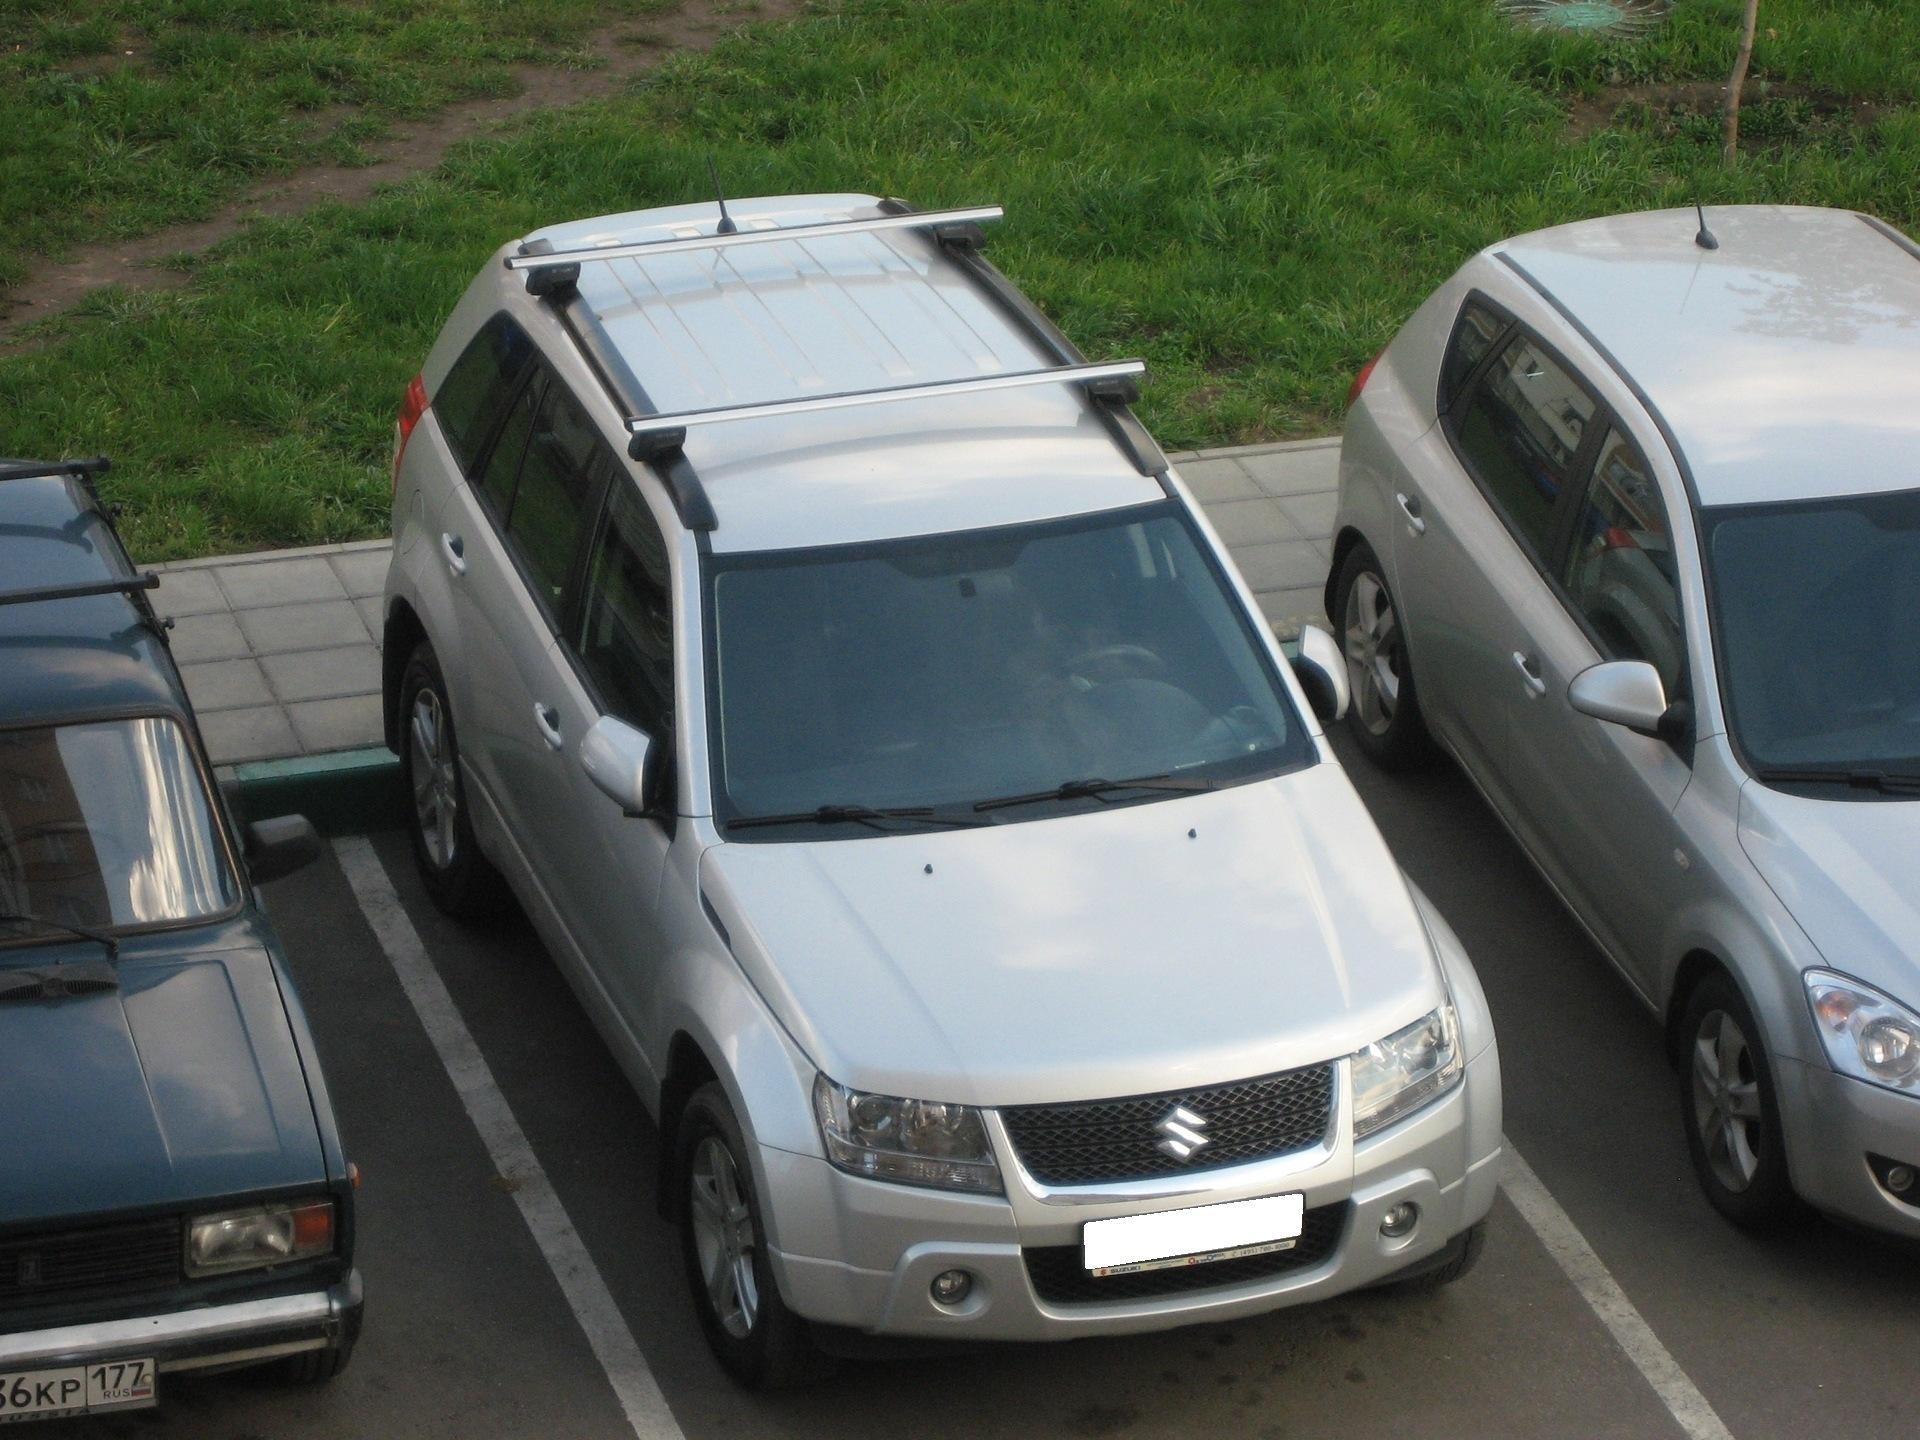 Багажник на крышу Сузуки Гранд Витара - Автобагажники